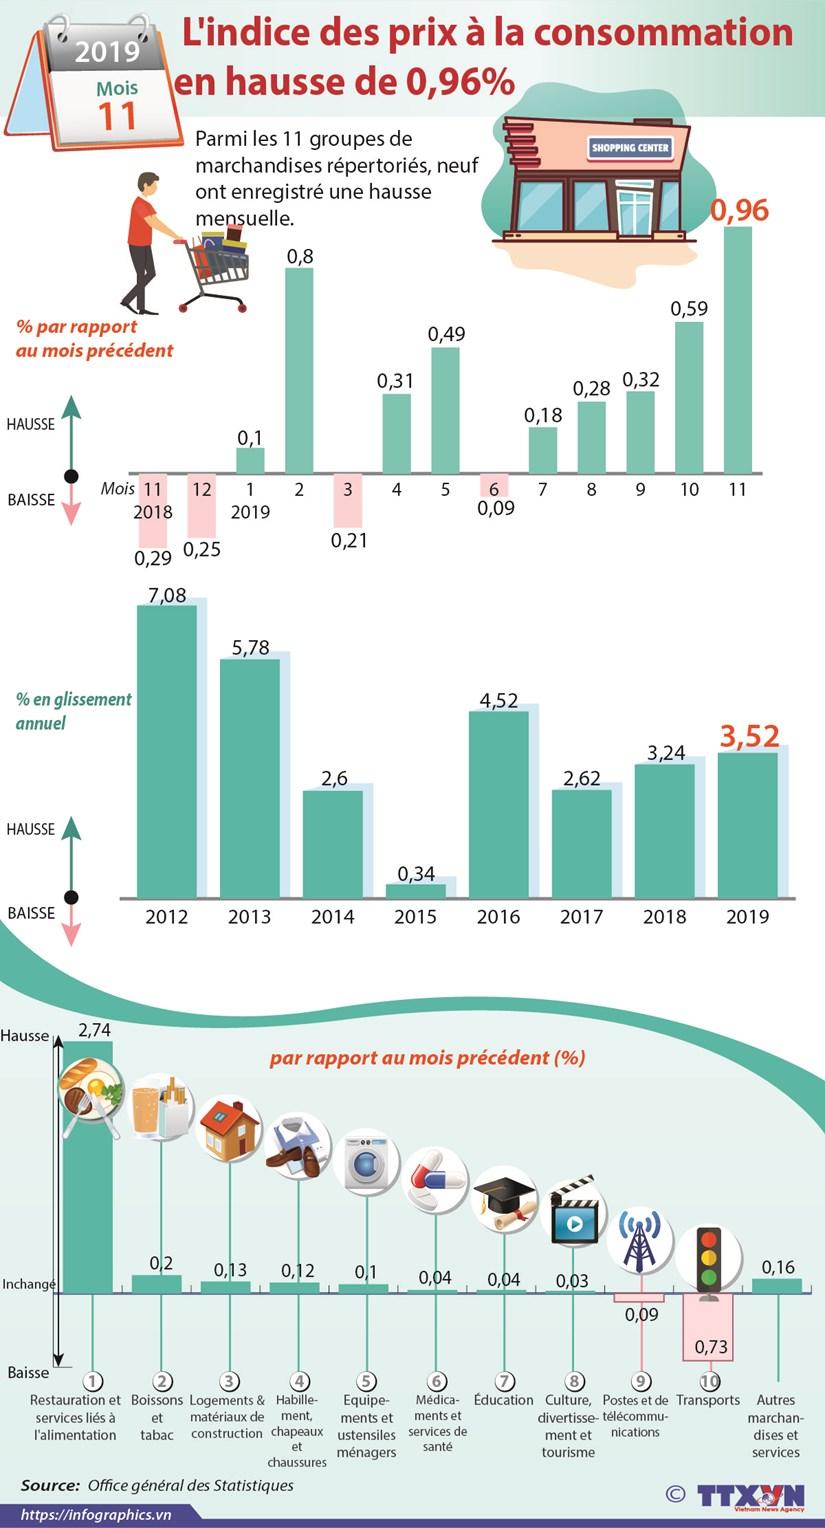 Novembre : l'indice des prix a la consommation en hausse de 0,96% hinh anh 1